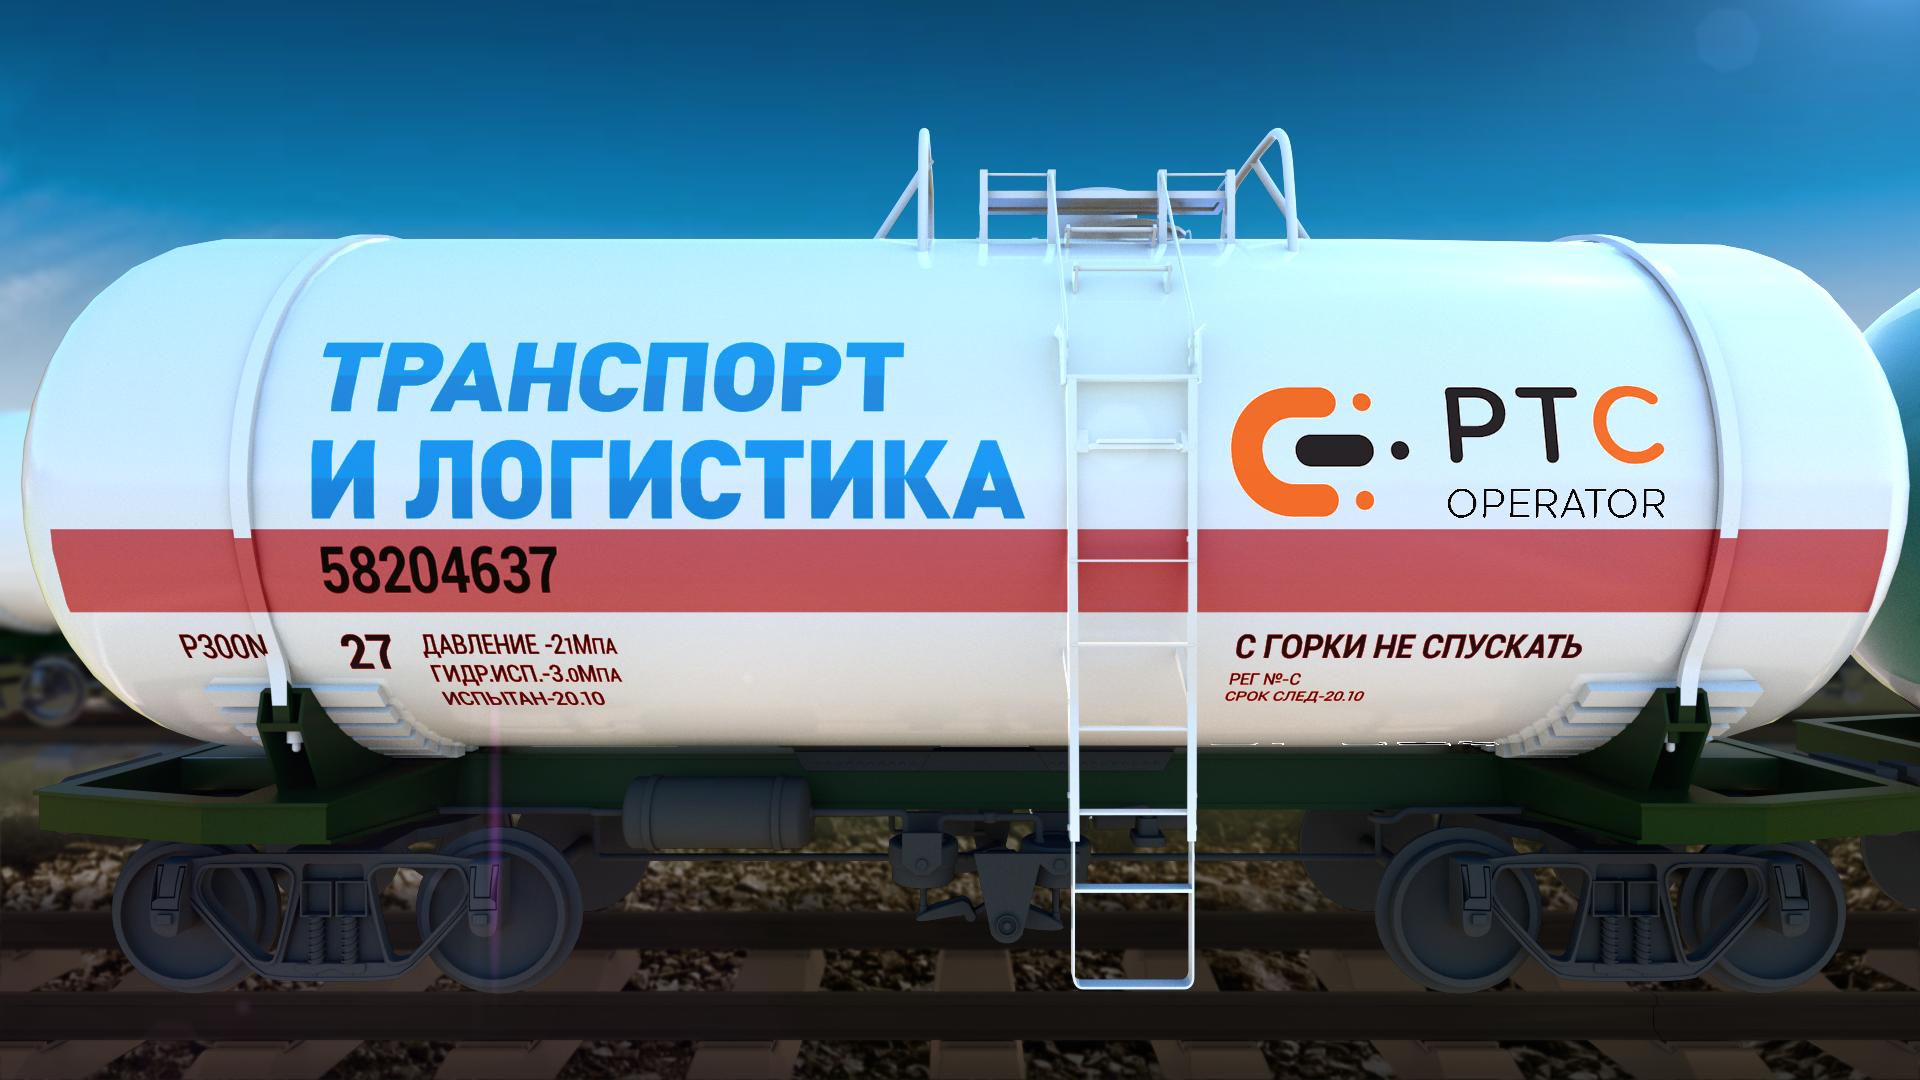 https://inbusiness.kz/ru/images/programbig/19/images/kFQmuWSB.png